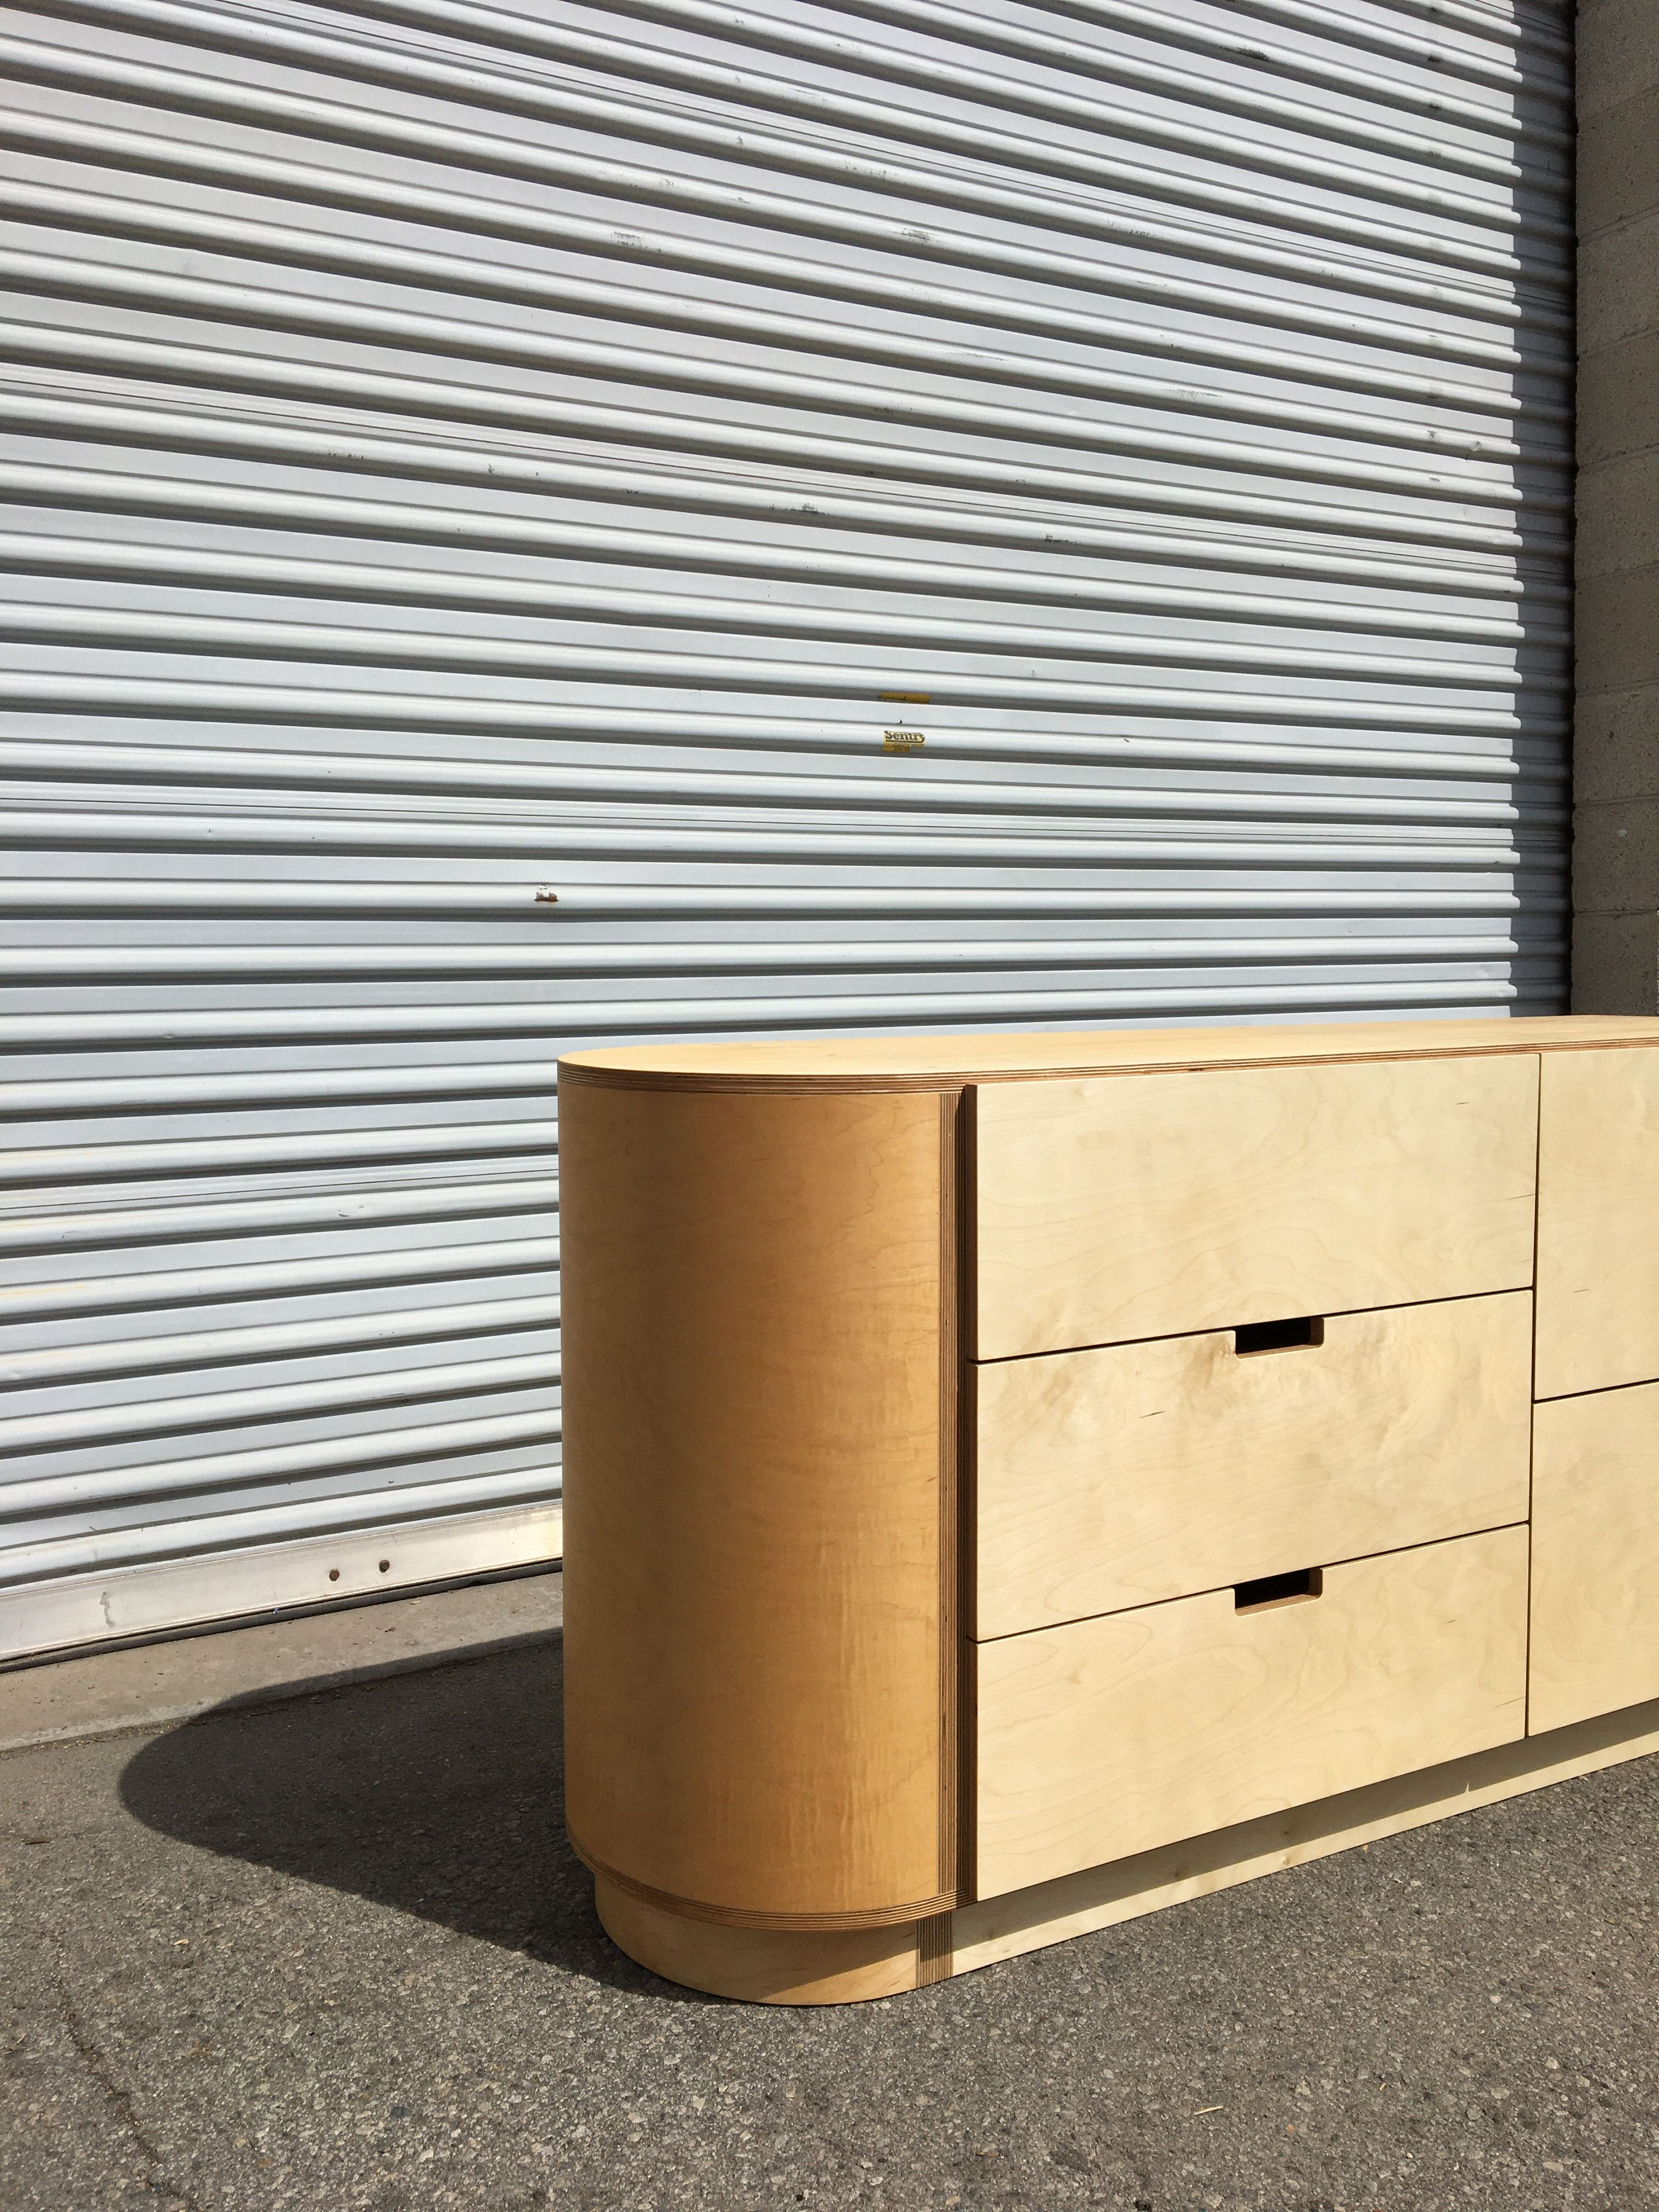 Half Round Dresser - Wide product image 4